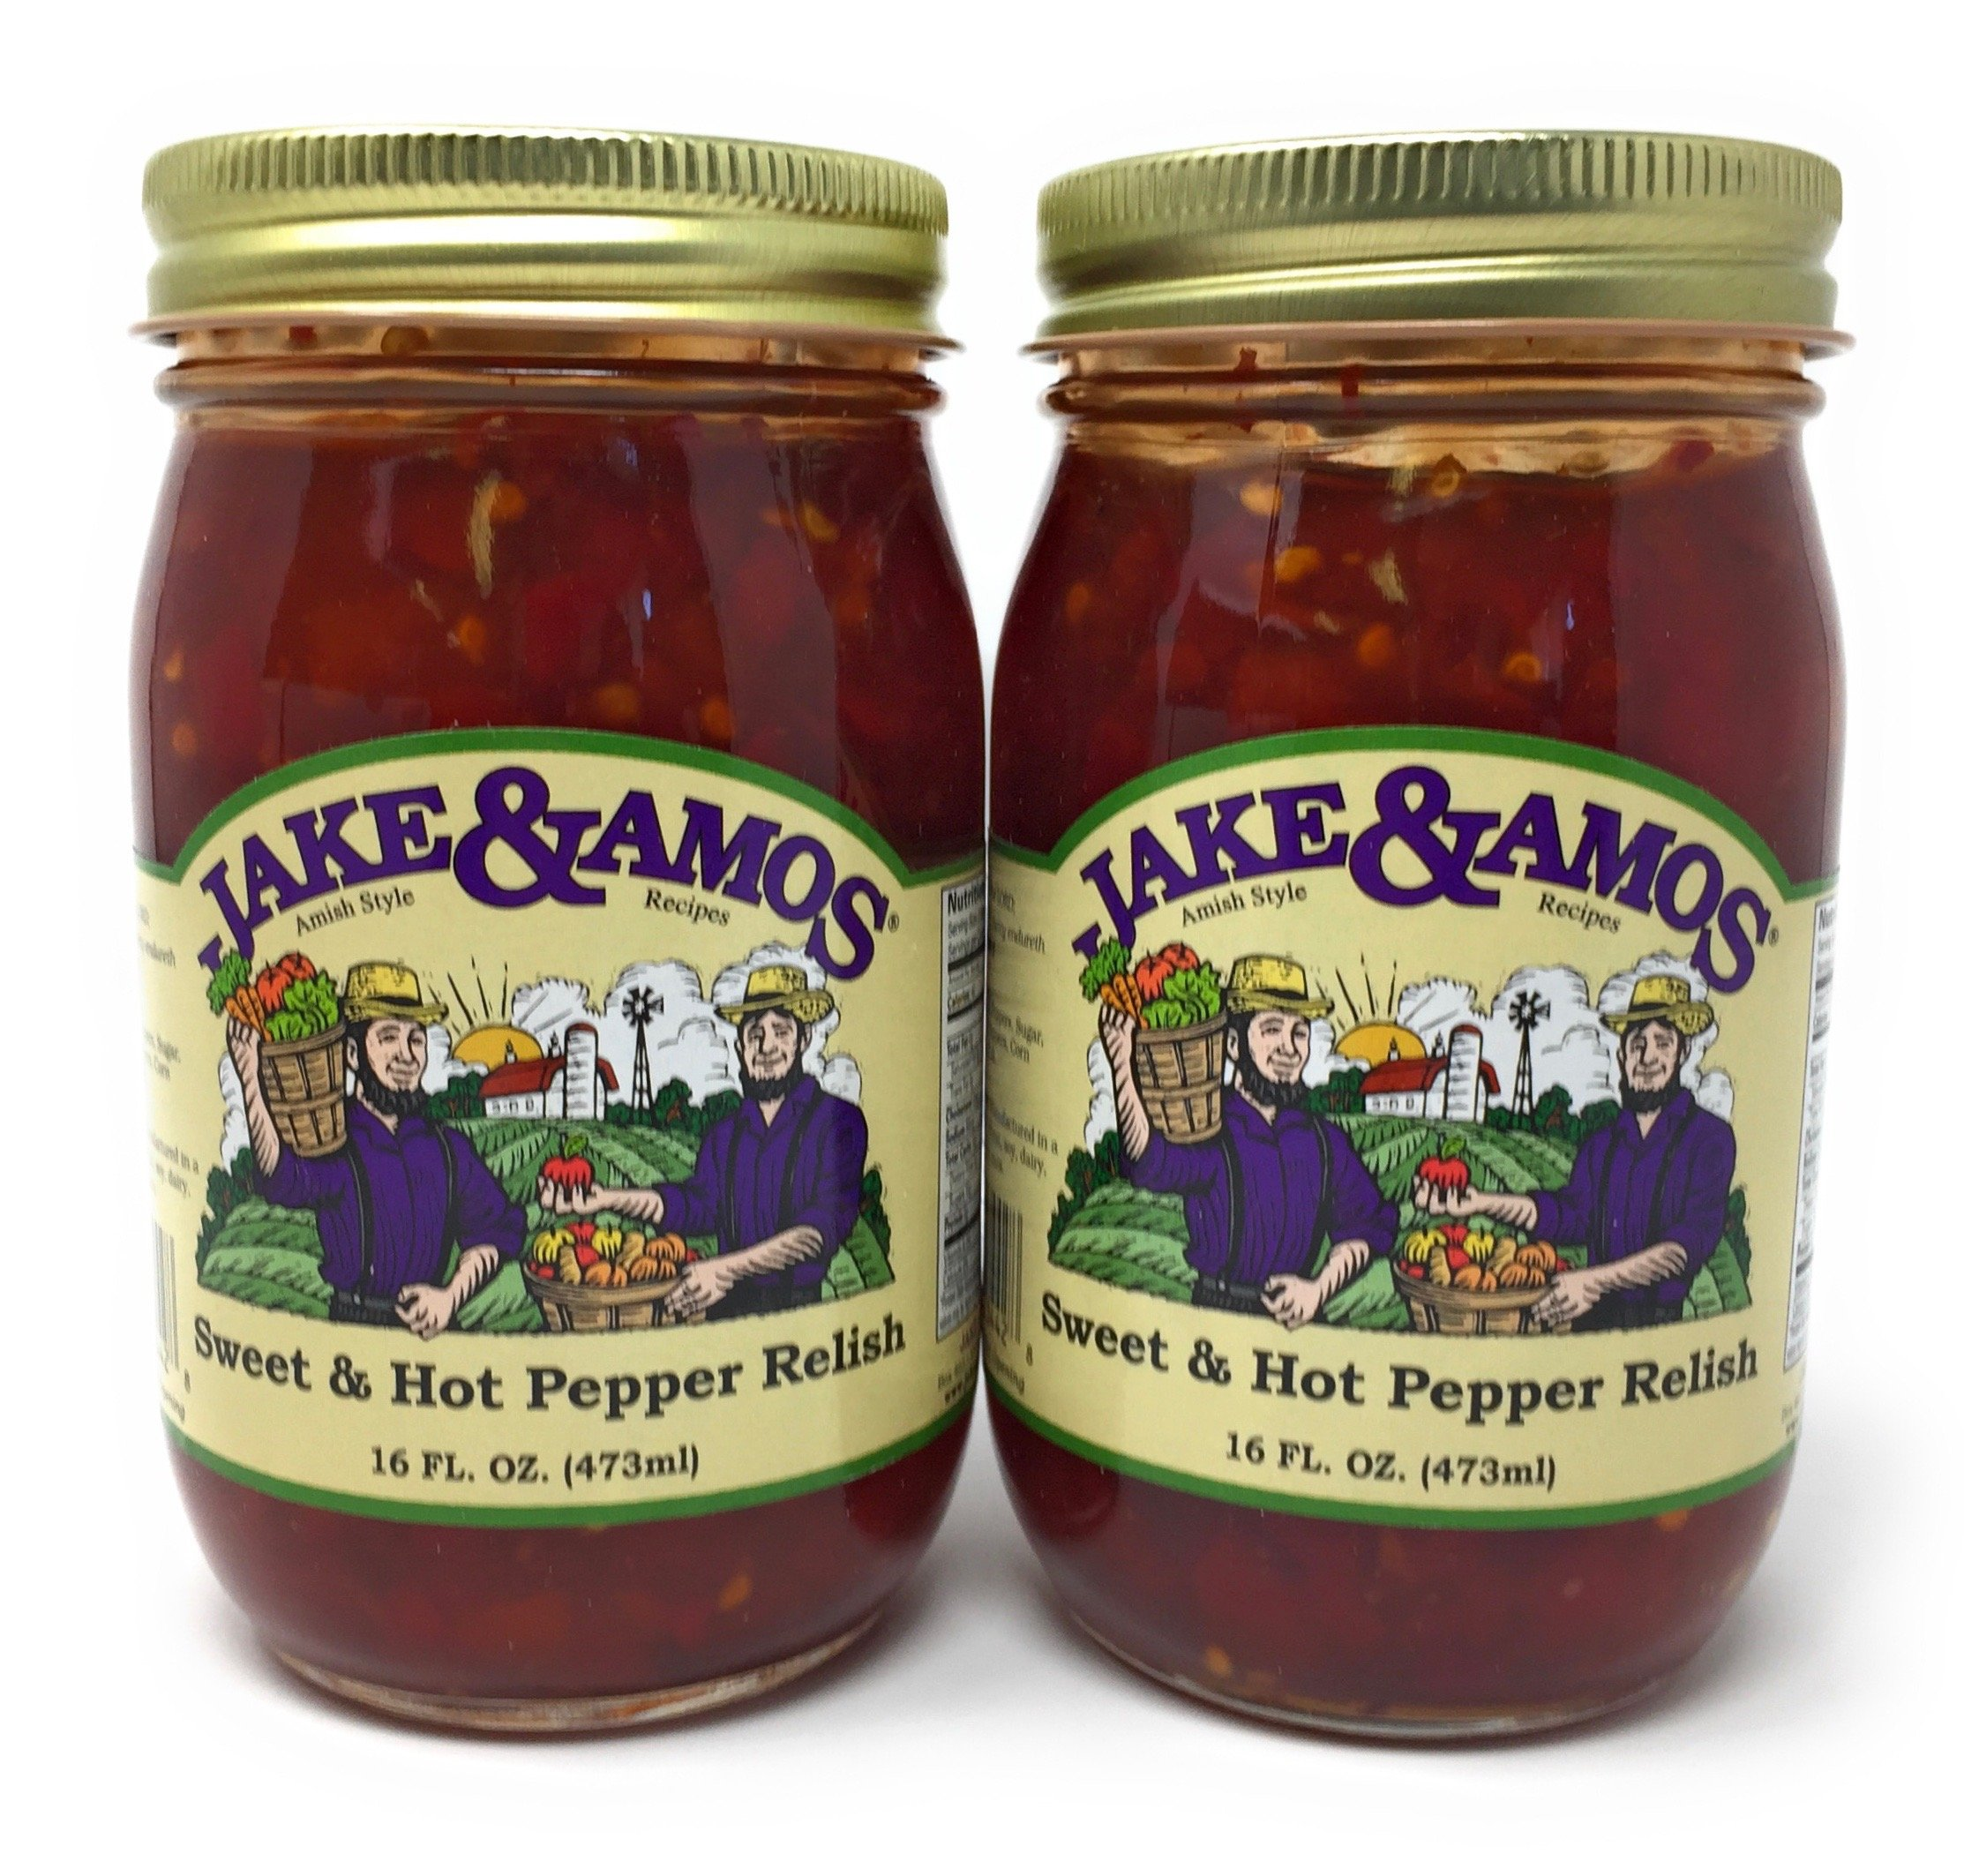 Jake & Amos Sweet & Hot Pepper Relish / 2 - 16 Oz. Jars